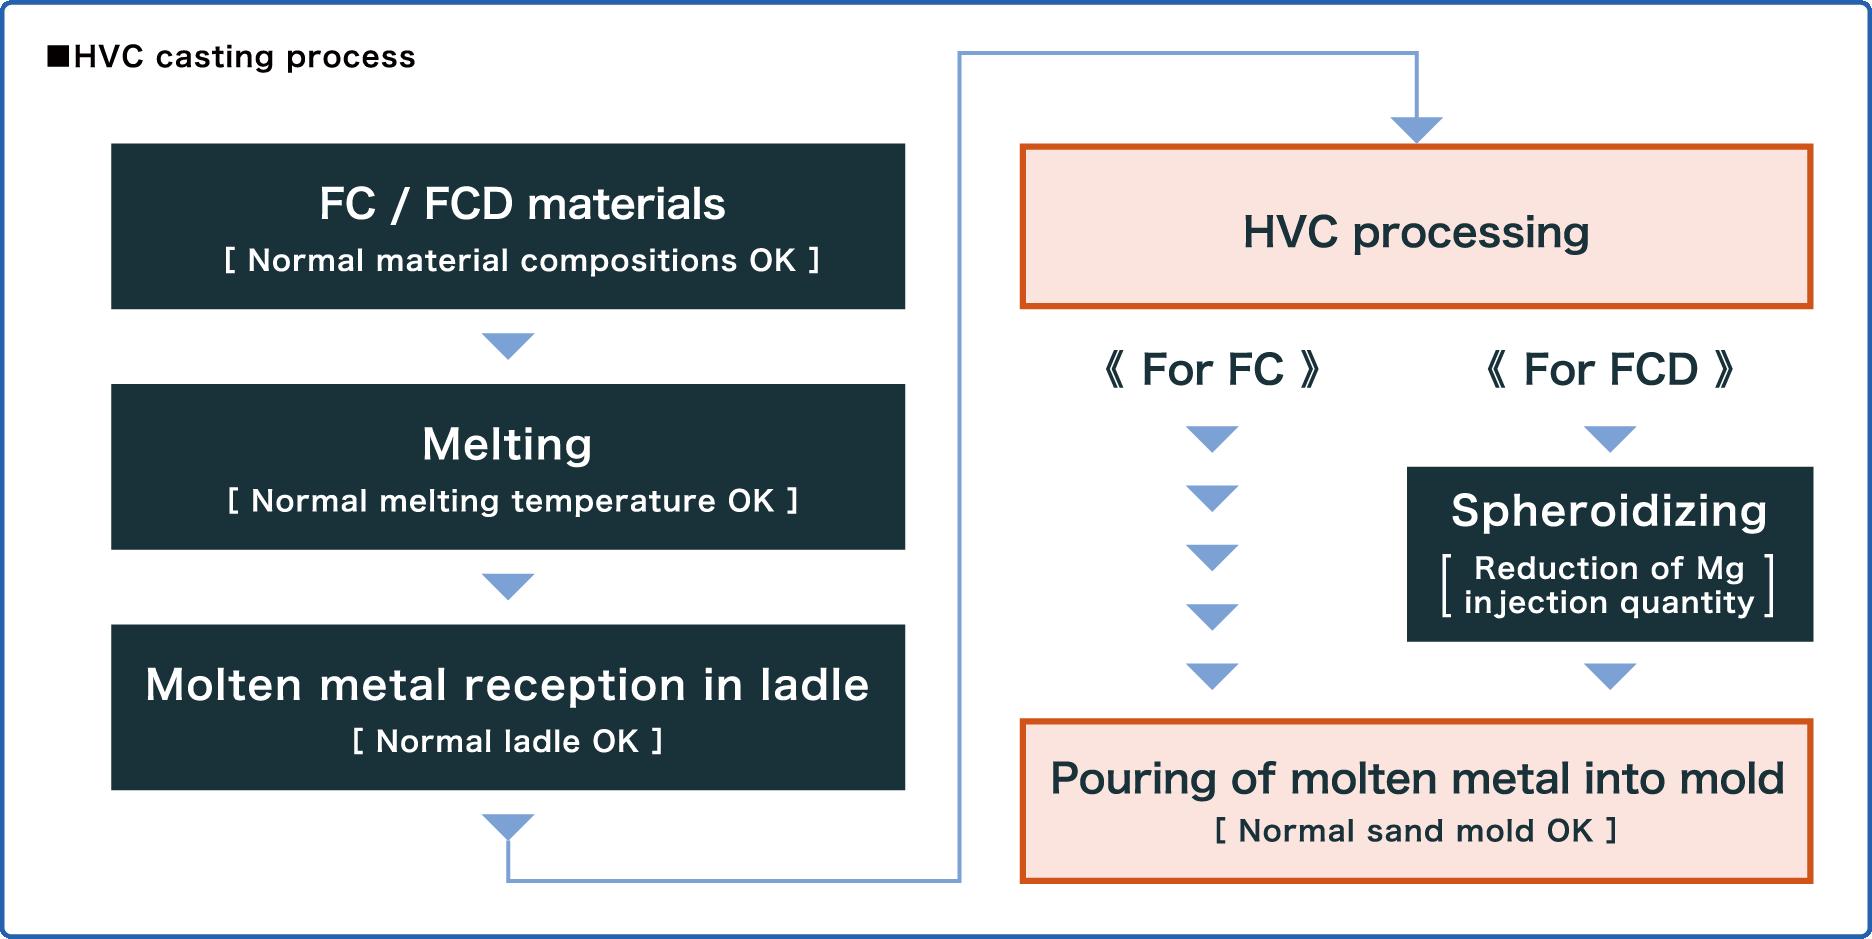 HVC casting process